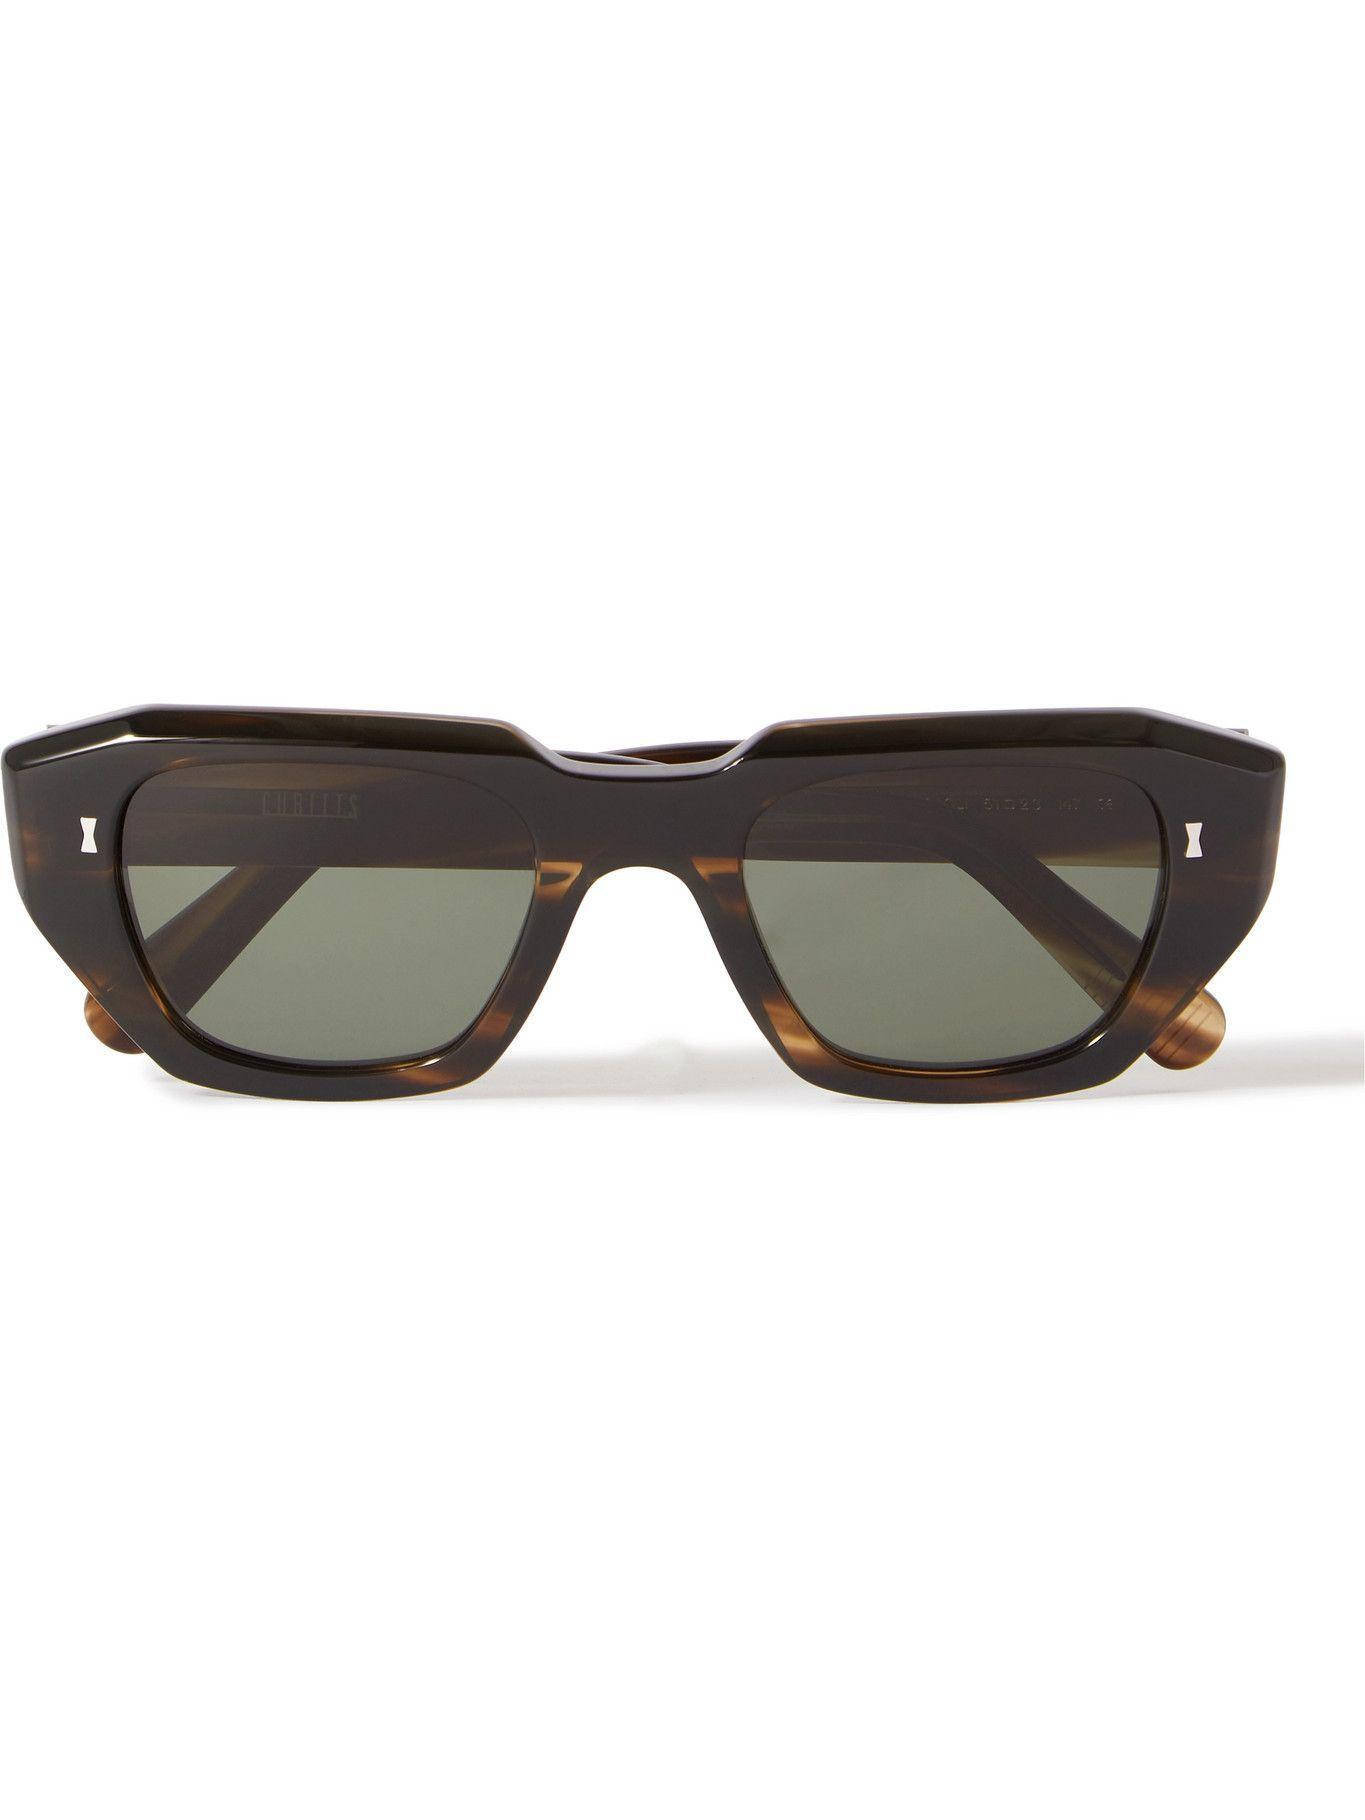 Photo: Cubitts - Sackville Square-Frame Tortoiseshell Acetate Sunglasses